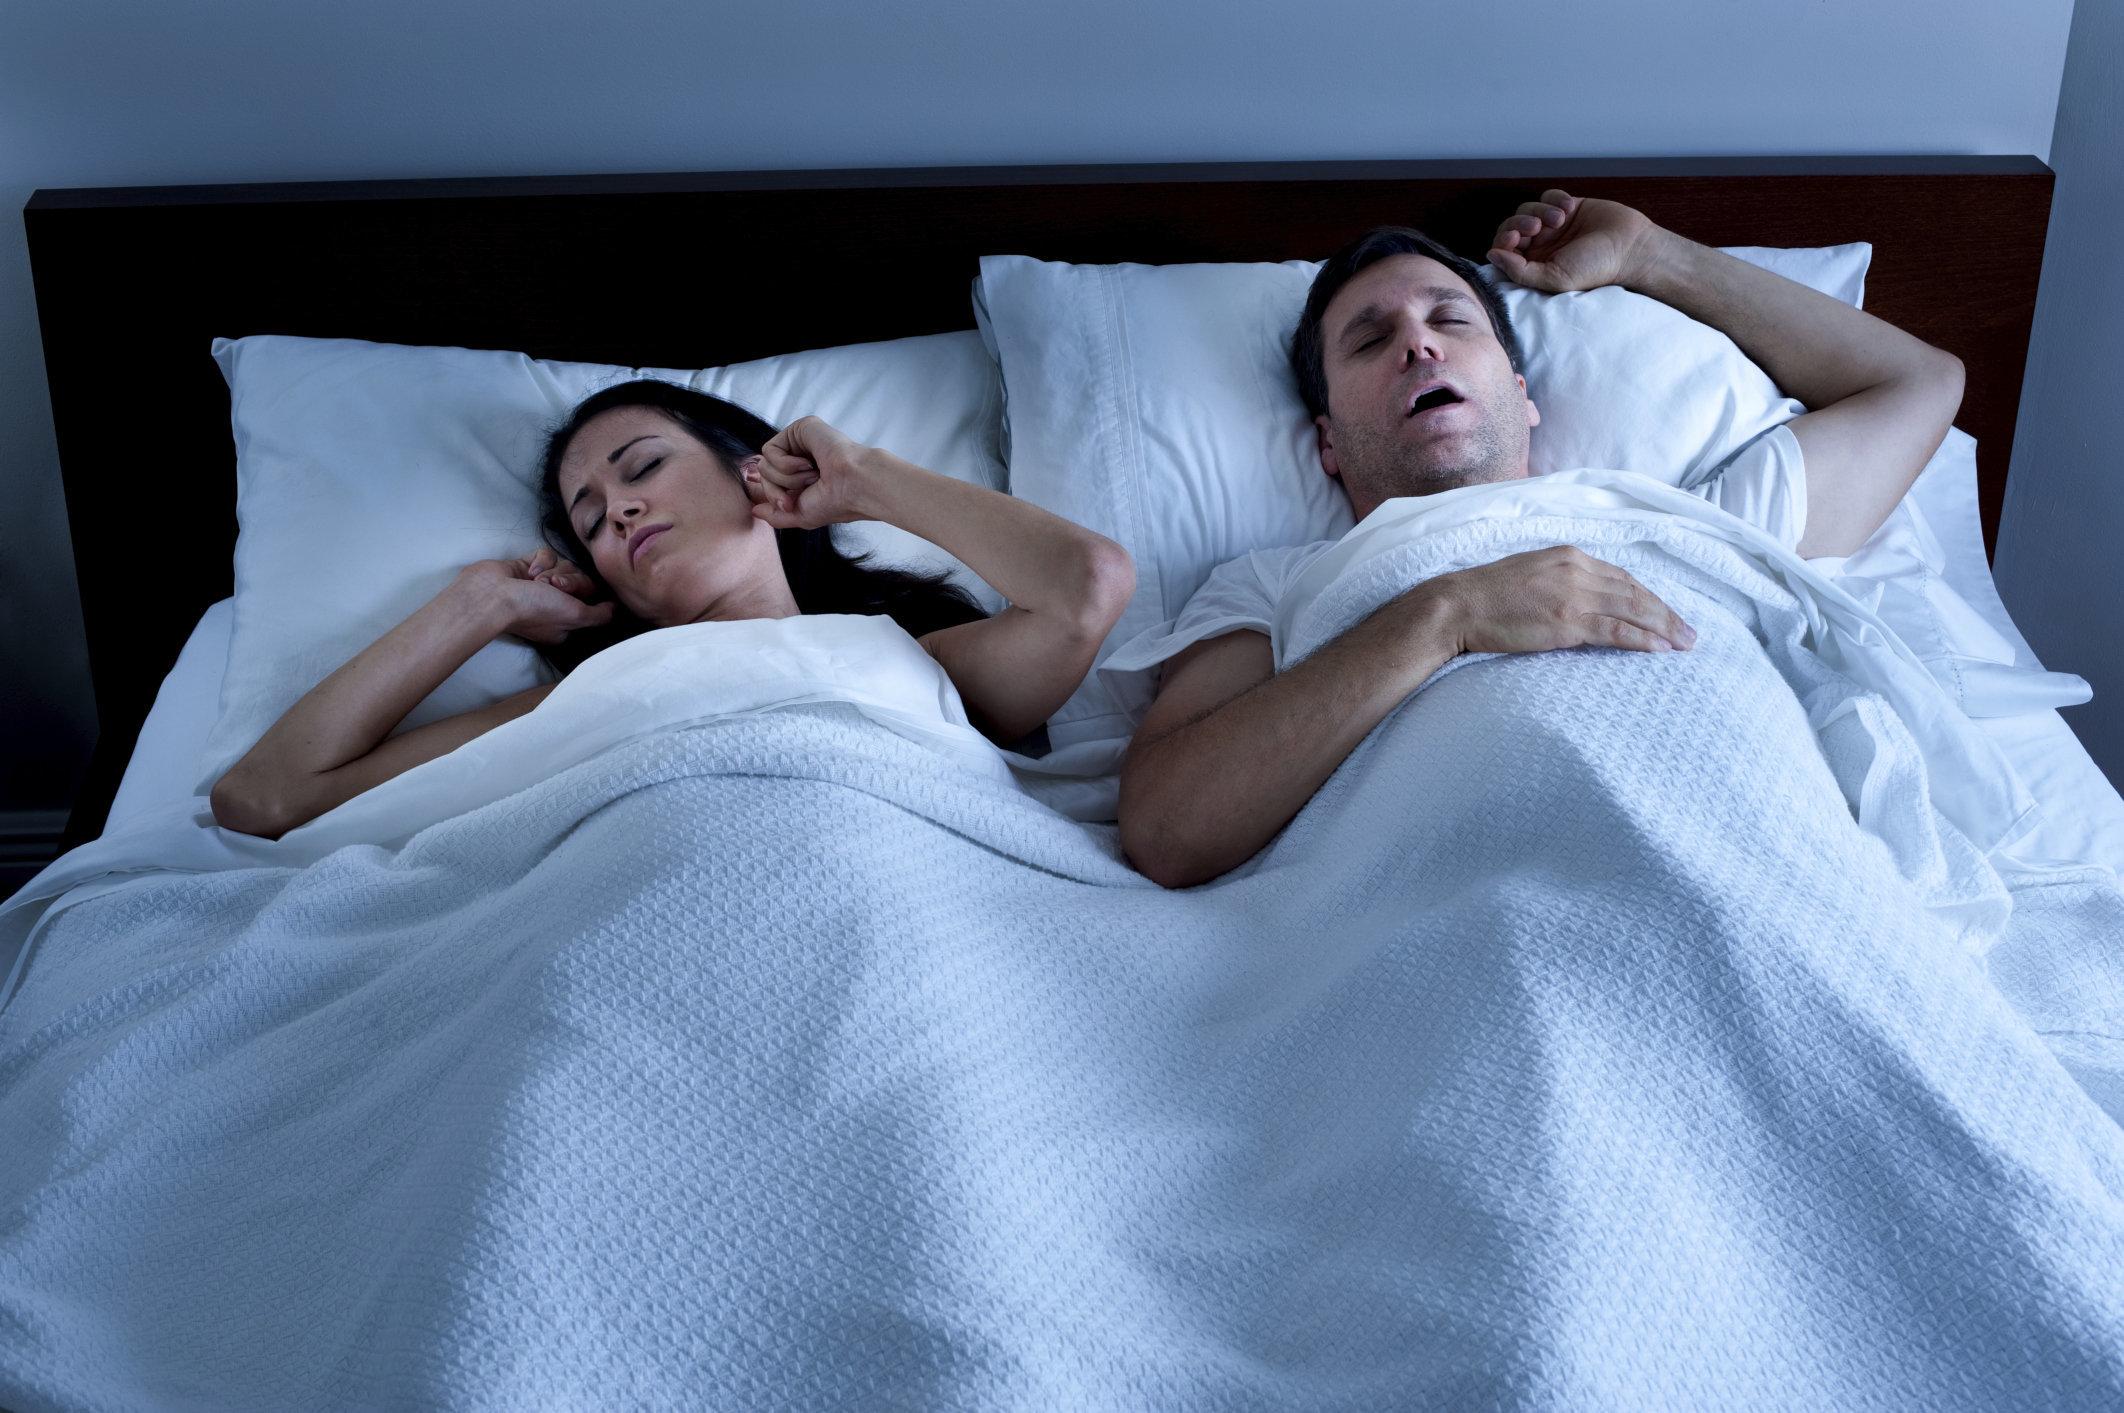 6 Things People With Sleep Apnea Wish You Knew